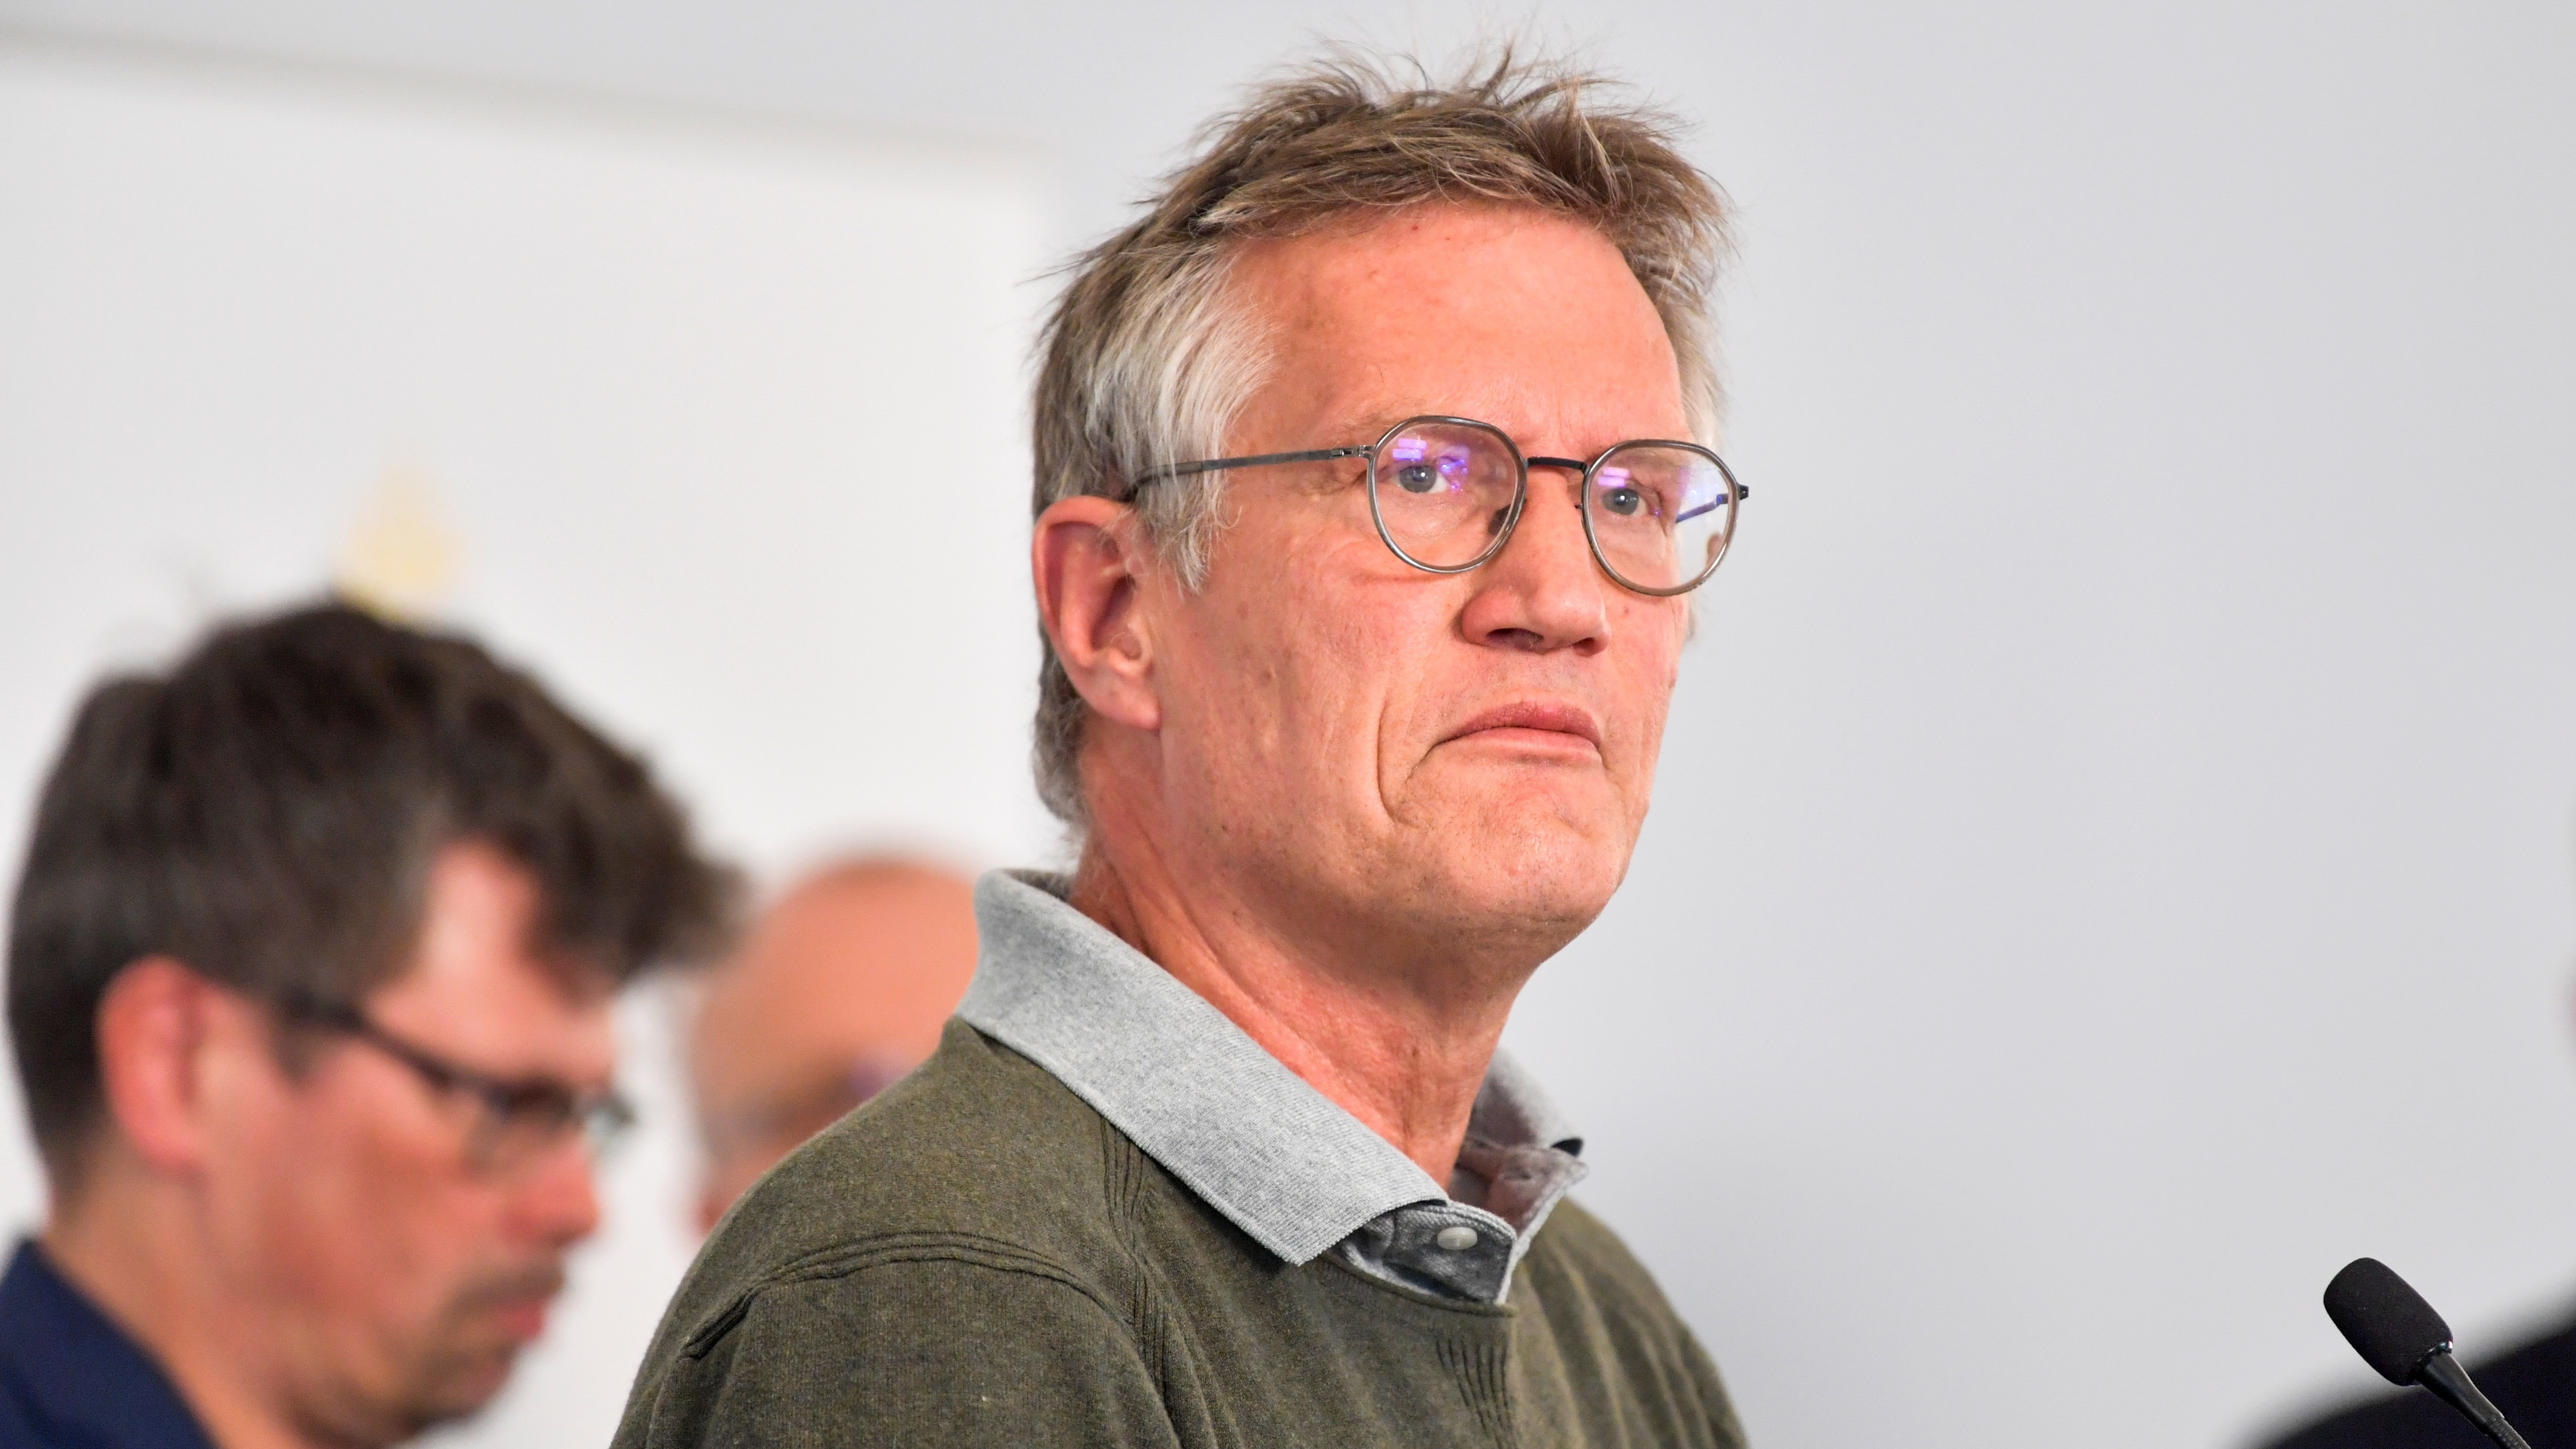 Sweden S Coronavirus Response Chief Acknowledges Potential For Improvement Coronavirus Updates Npr